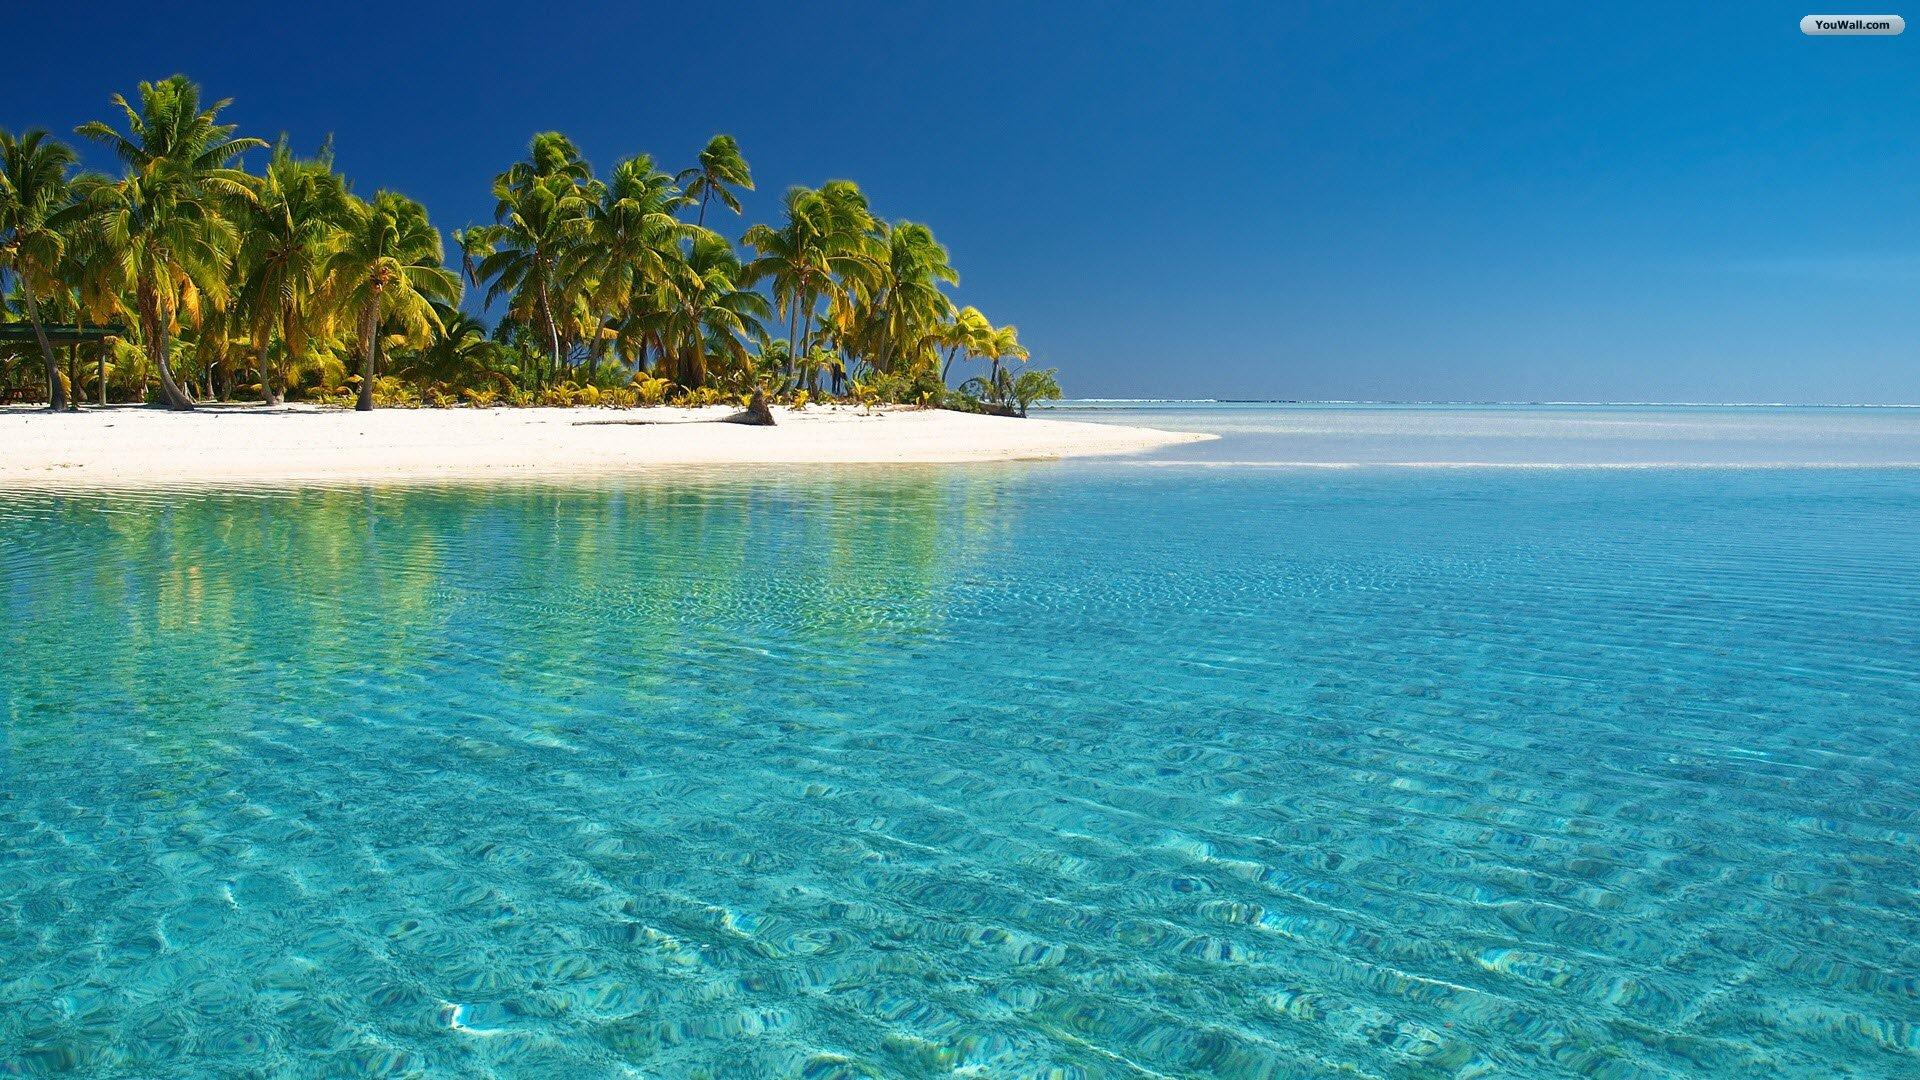 beach tropical wallpapers paradise island glass wallpaper water 1920x1080